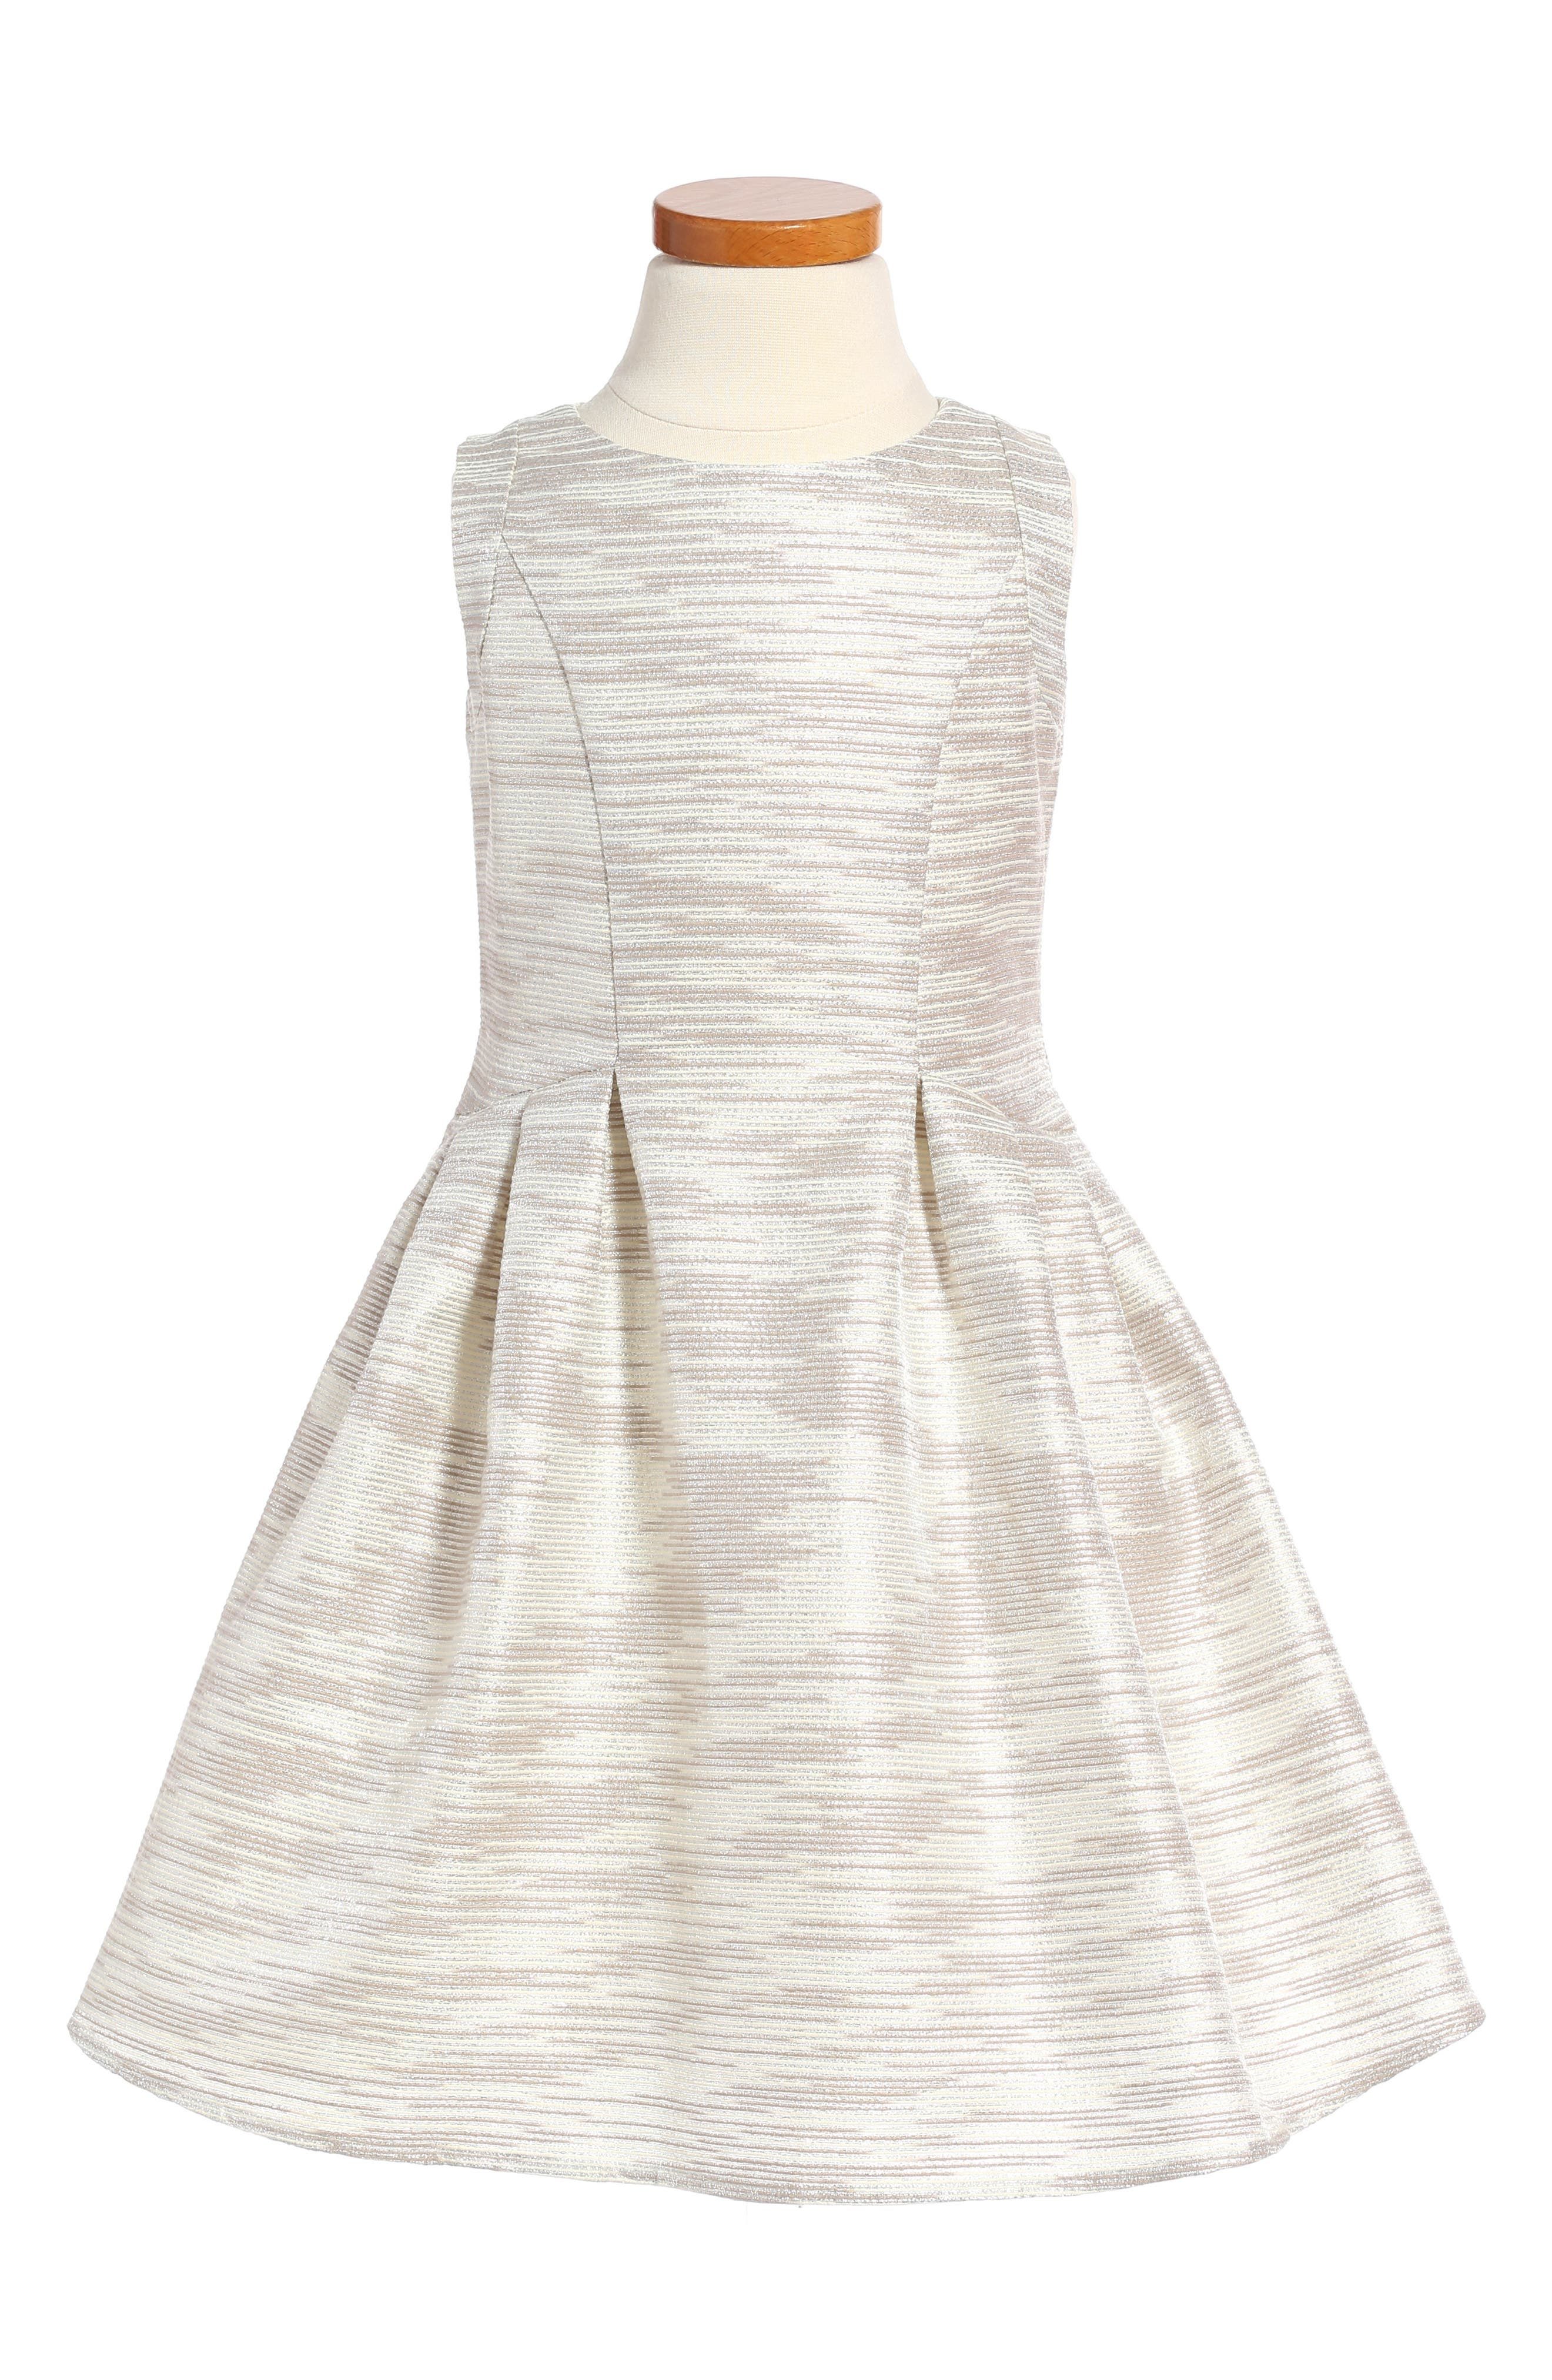 Little Angels Stripe Brocade Sleeveless Dress (Toddler Girls & Little Girls)